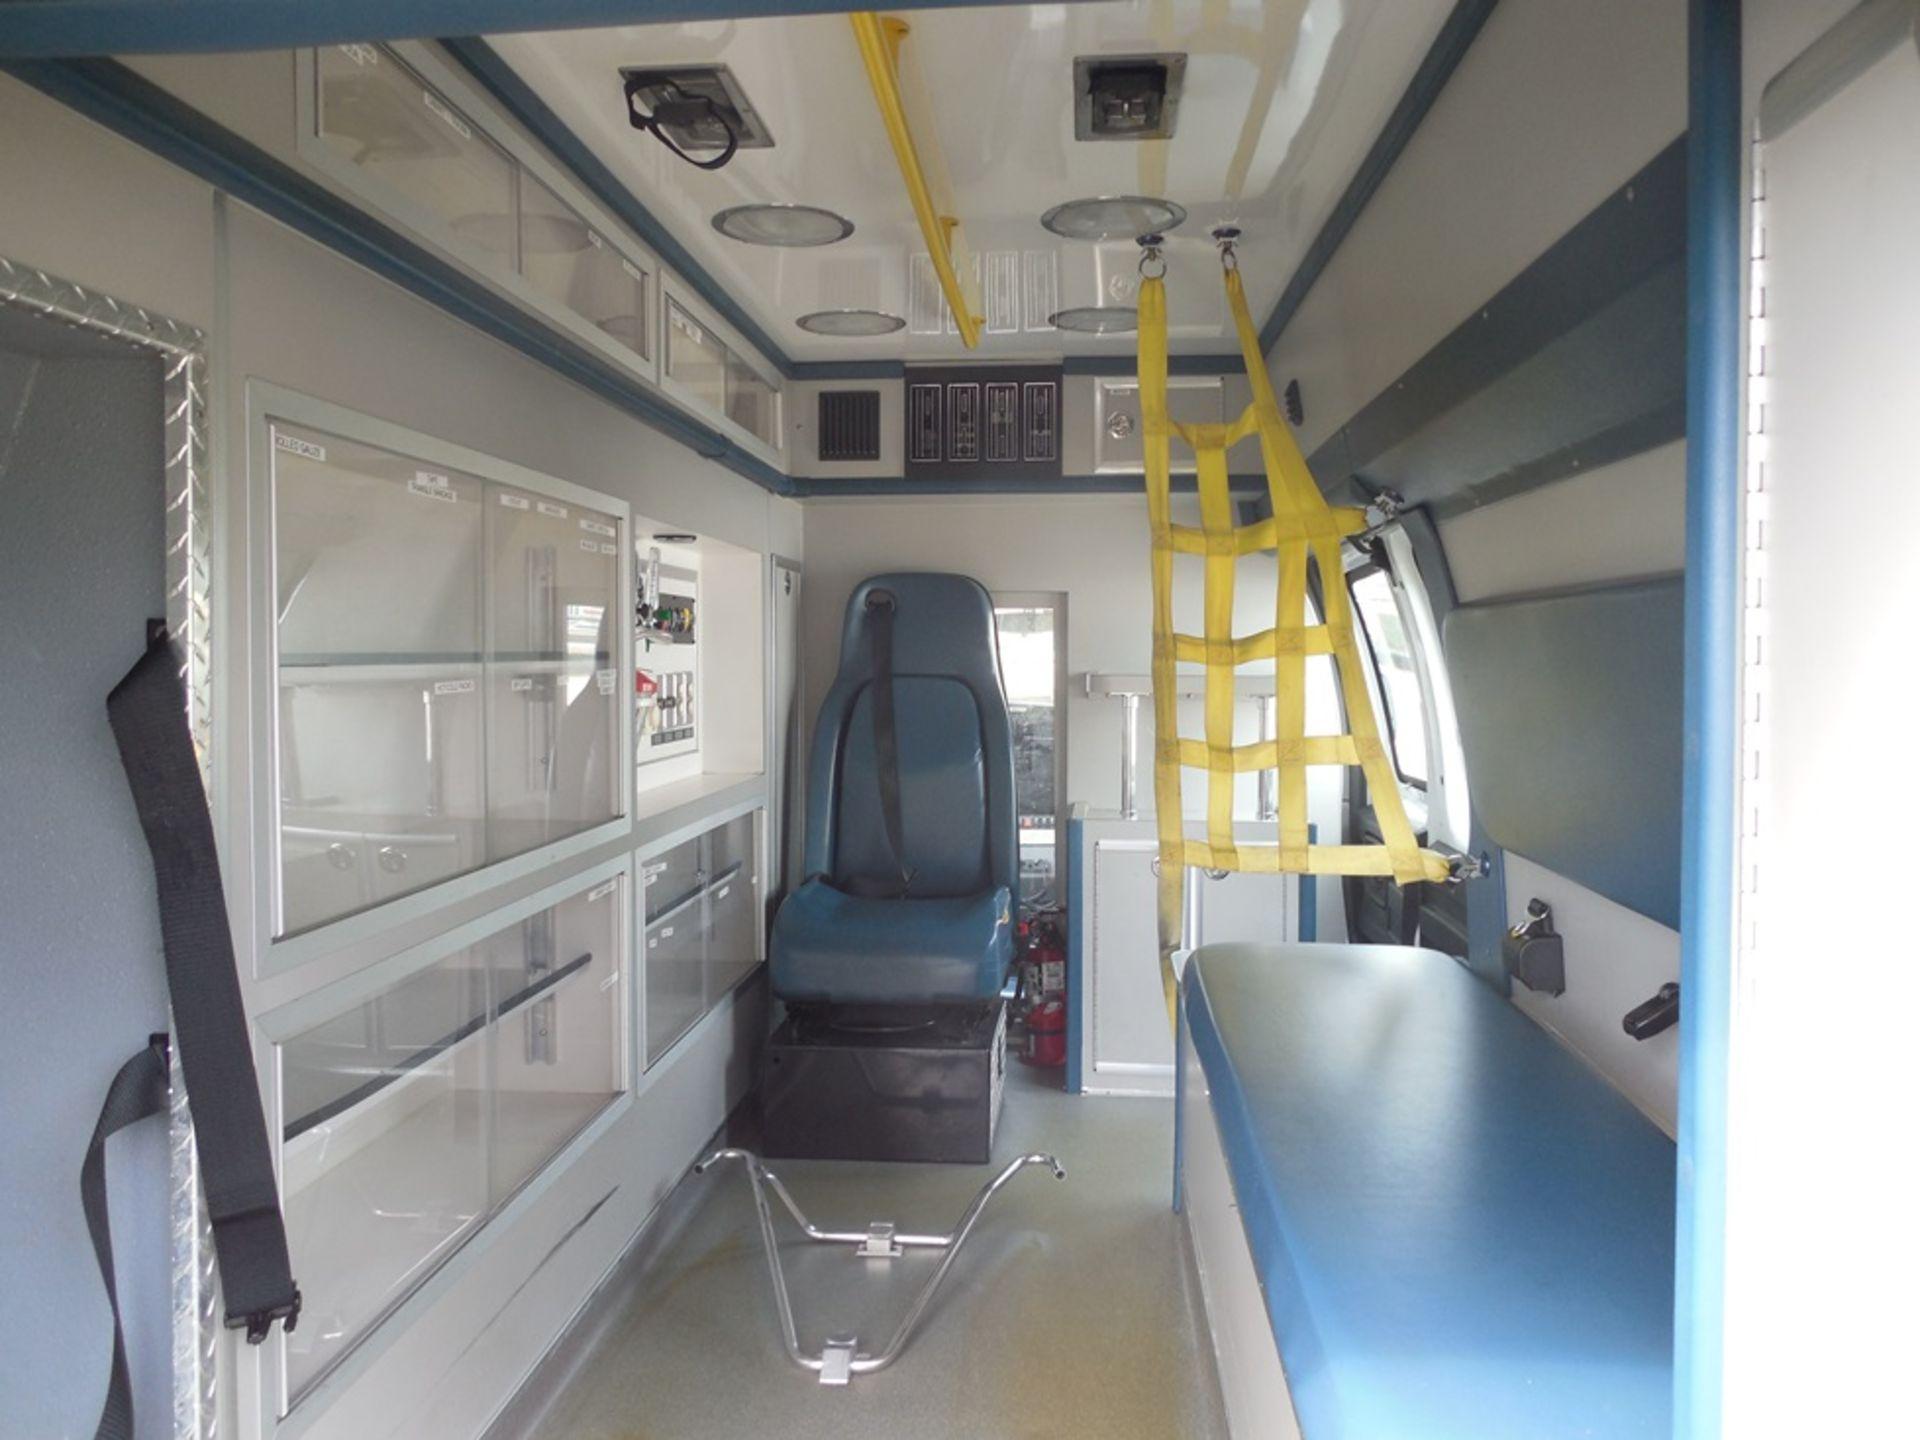 2013 Chev van ambulance dsl, Express Stable Trac 204,709 miles vin# 1GBZGUC13D1130018 - Image 6 of 6